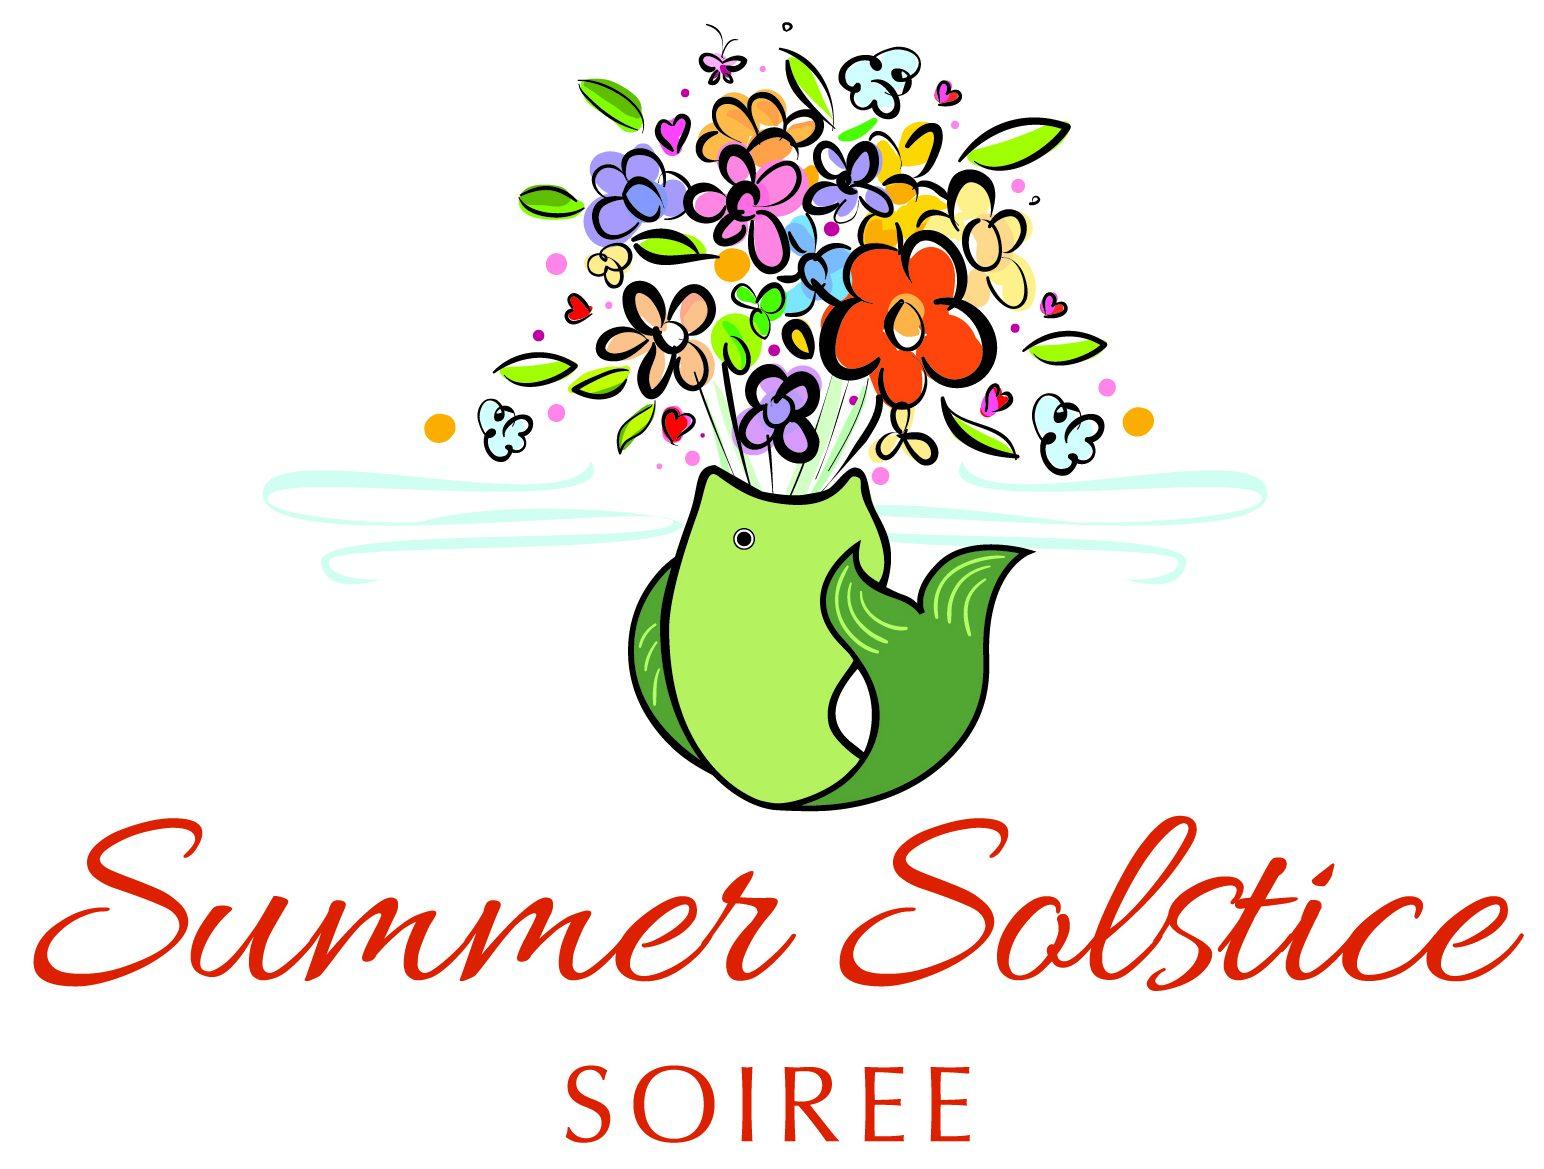 2017 clipart summer solstice. Lowell parks conservation trustsummer